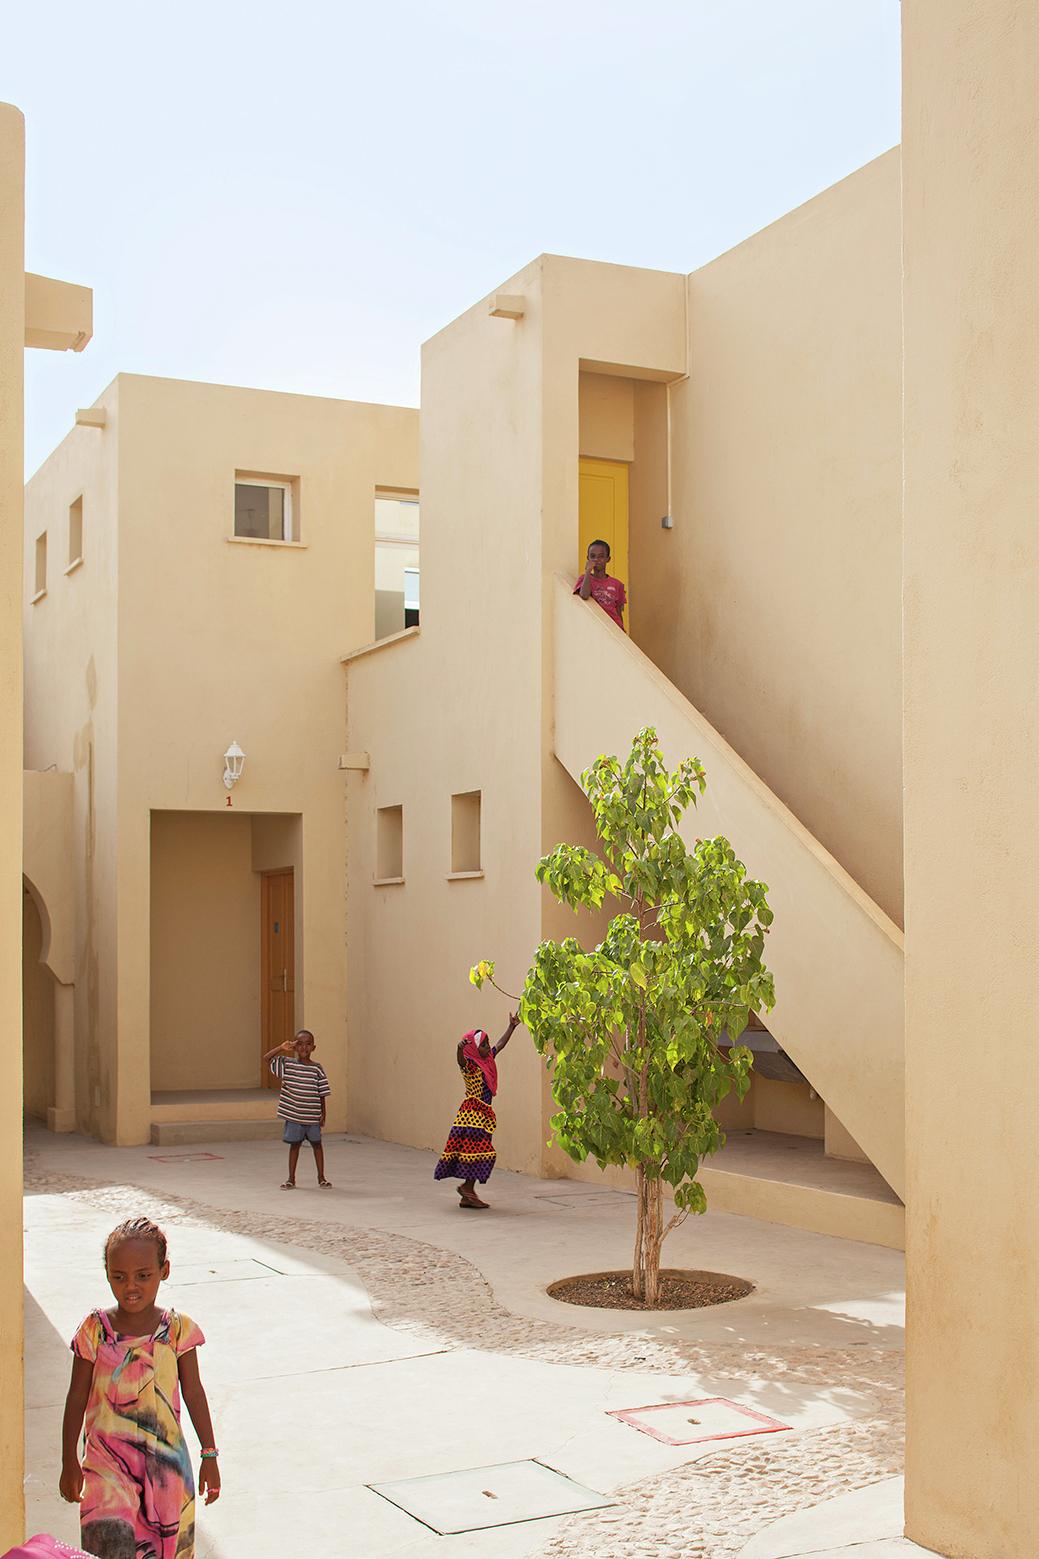 SOS_Village_Djibouti_-_Squares_(17).jpg